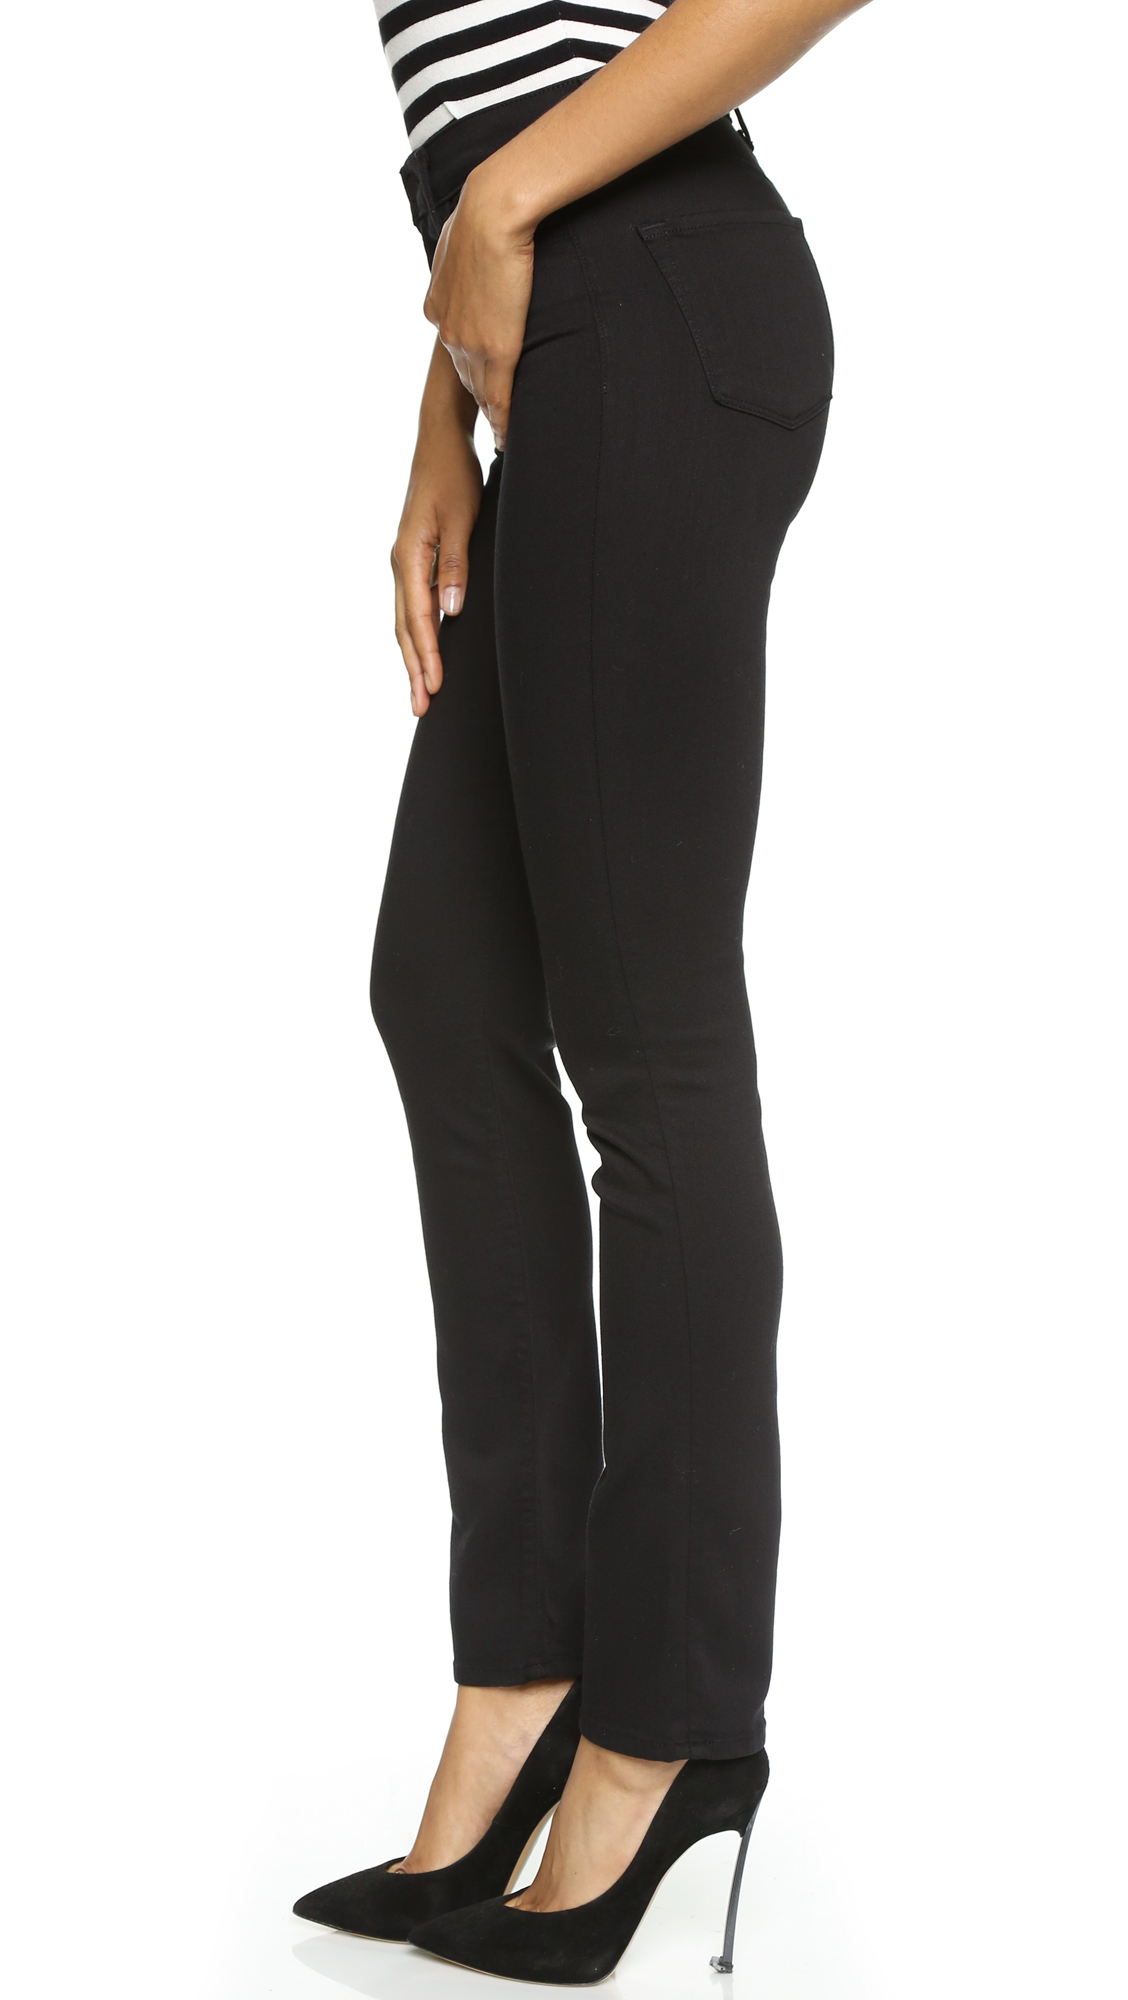 j brand maria high rise jeans in black lyst. Black Bedroom Furniture Sets. Home Design Ideas